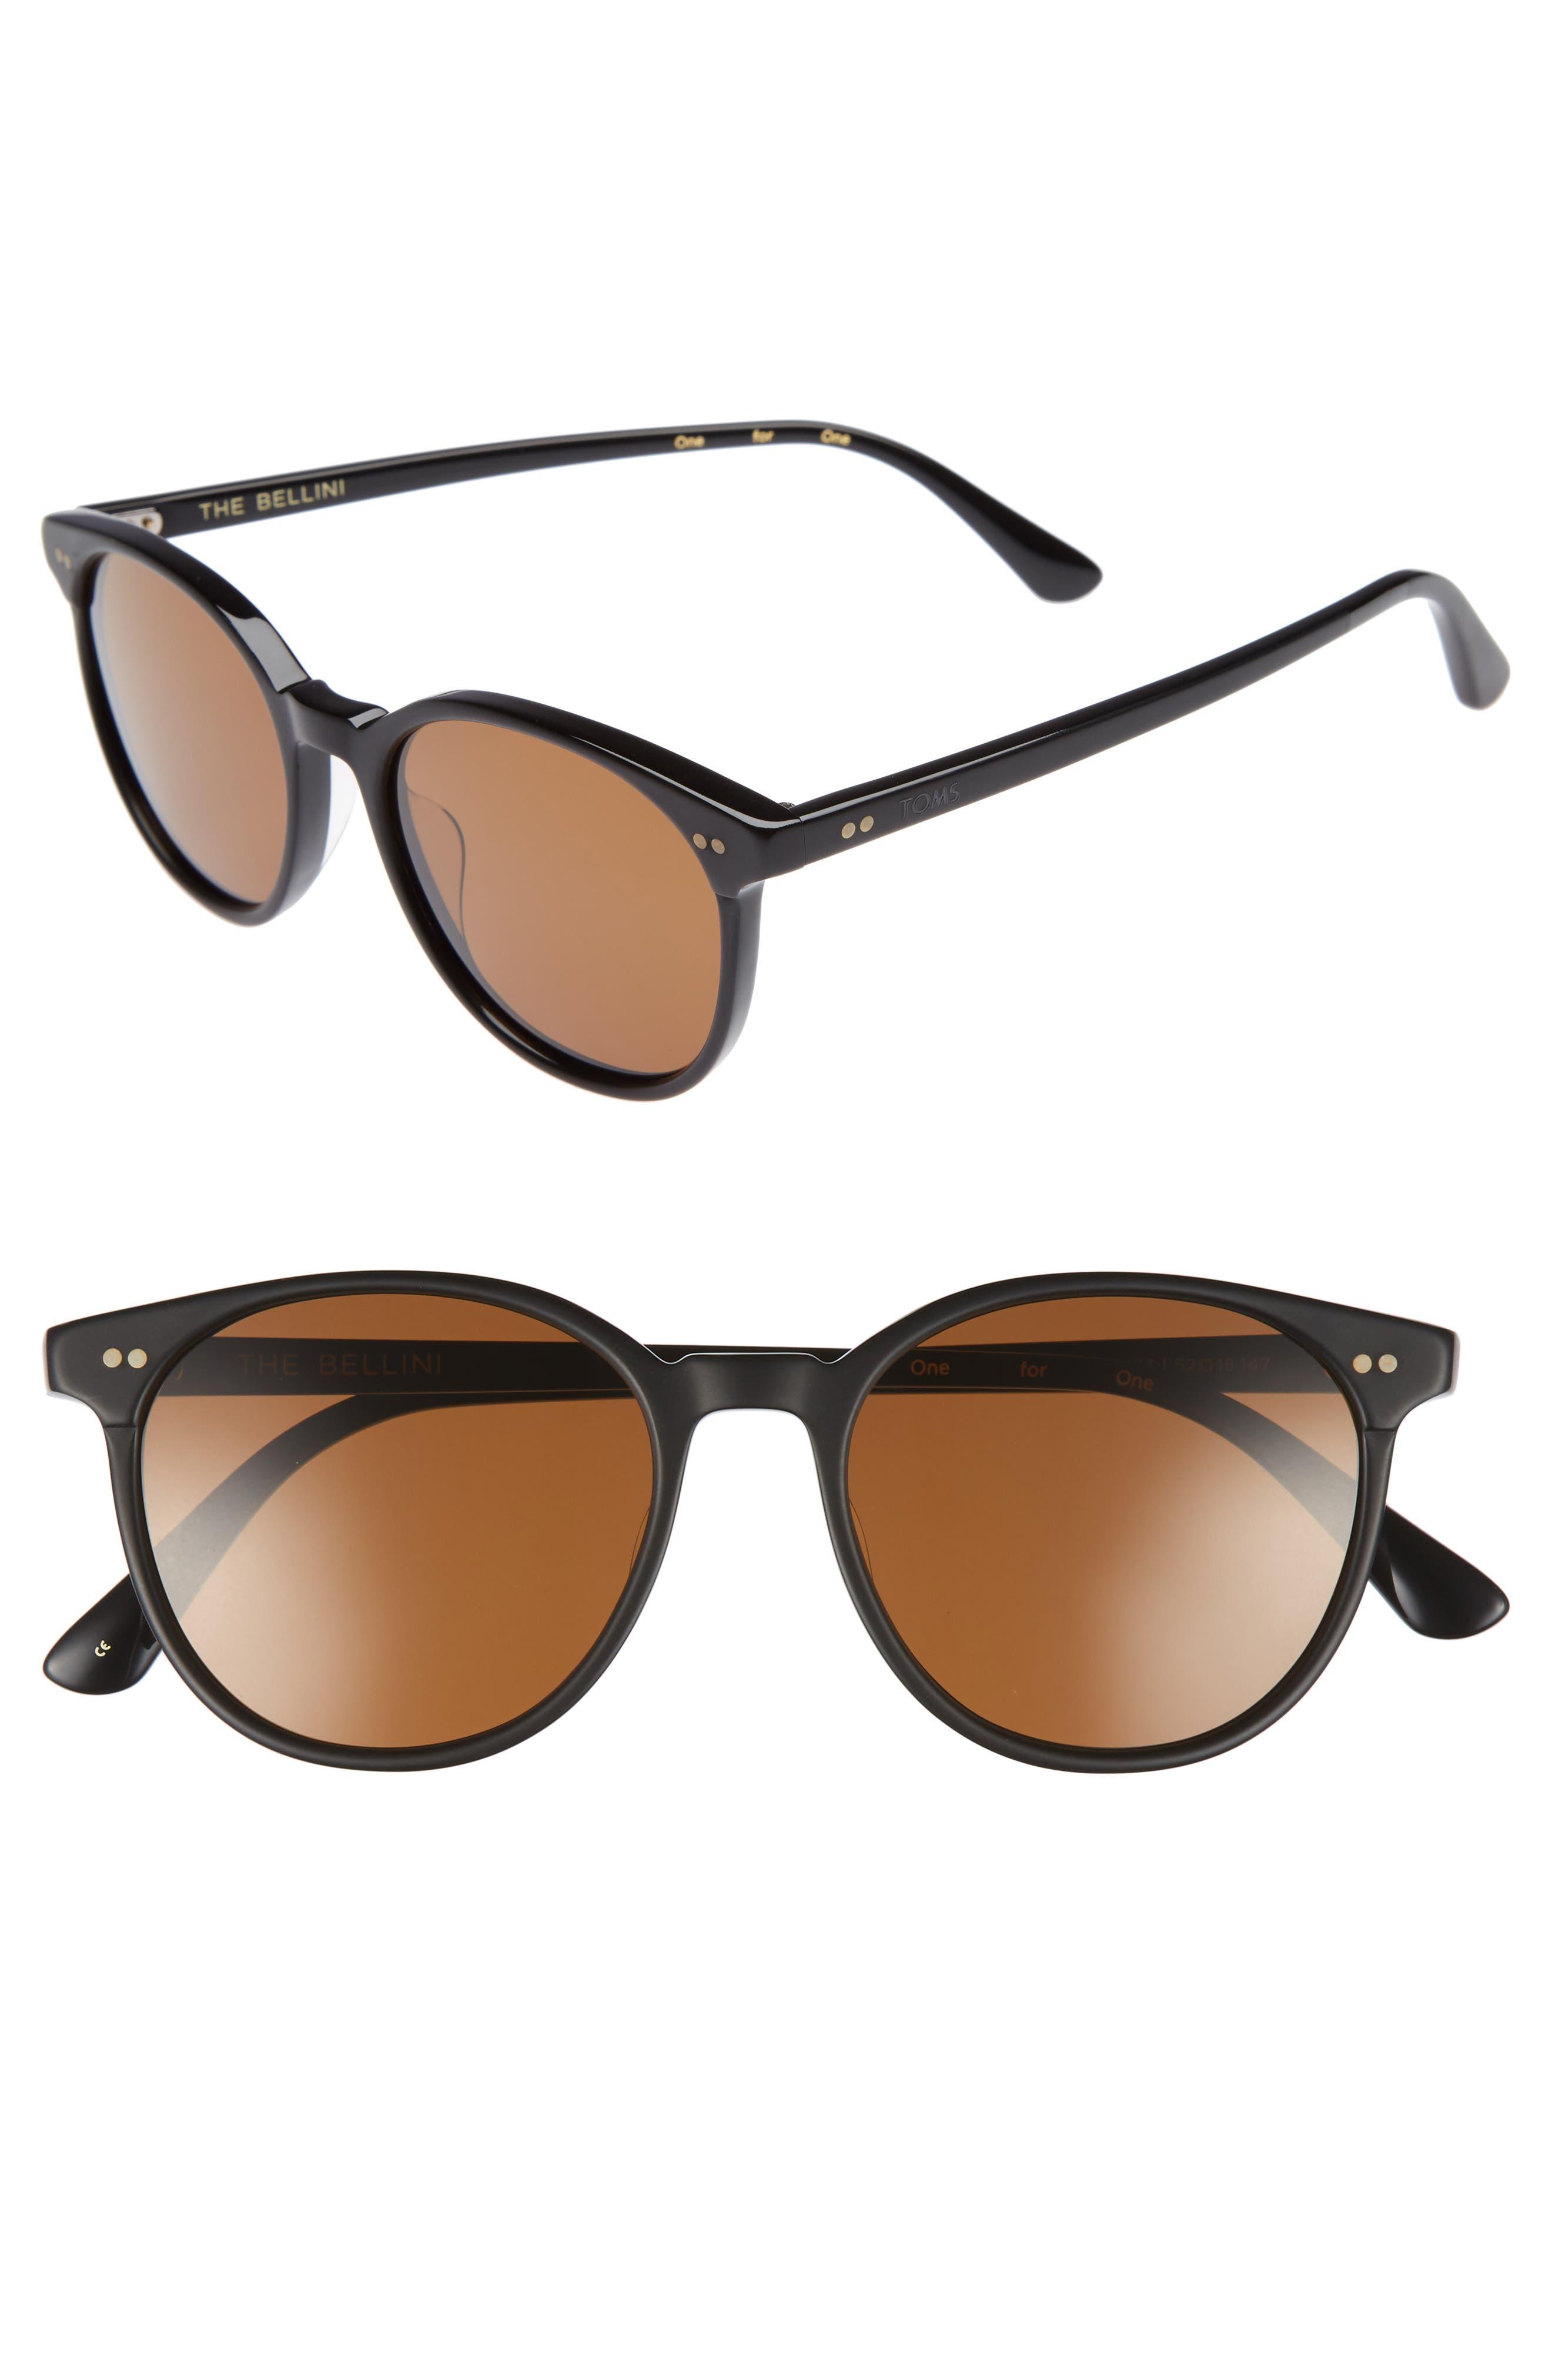 Bellini 52mm Sunglasses,                         Main,                         color, Matte Black